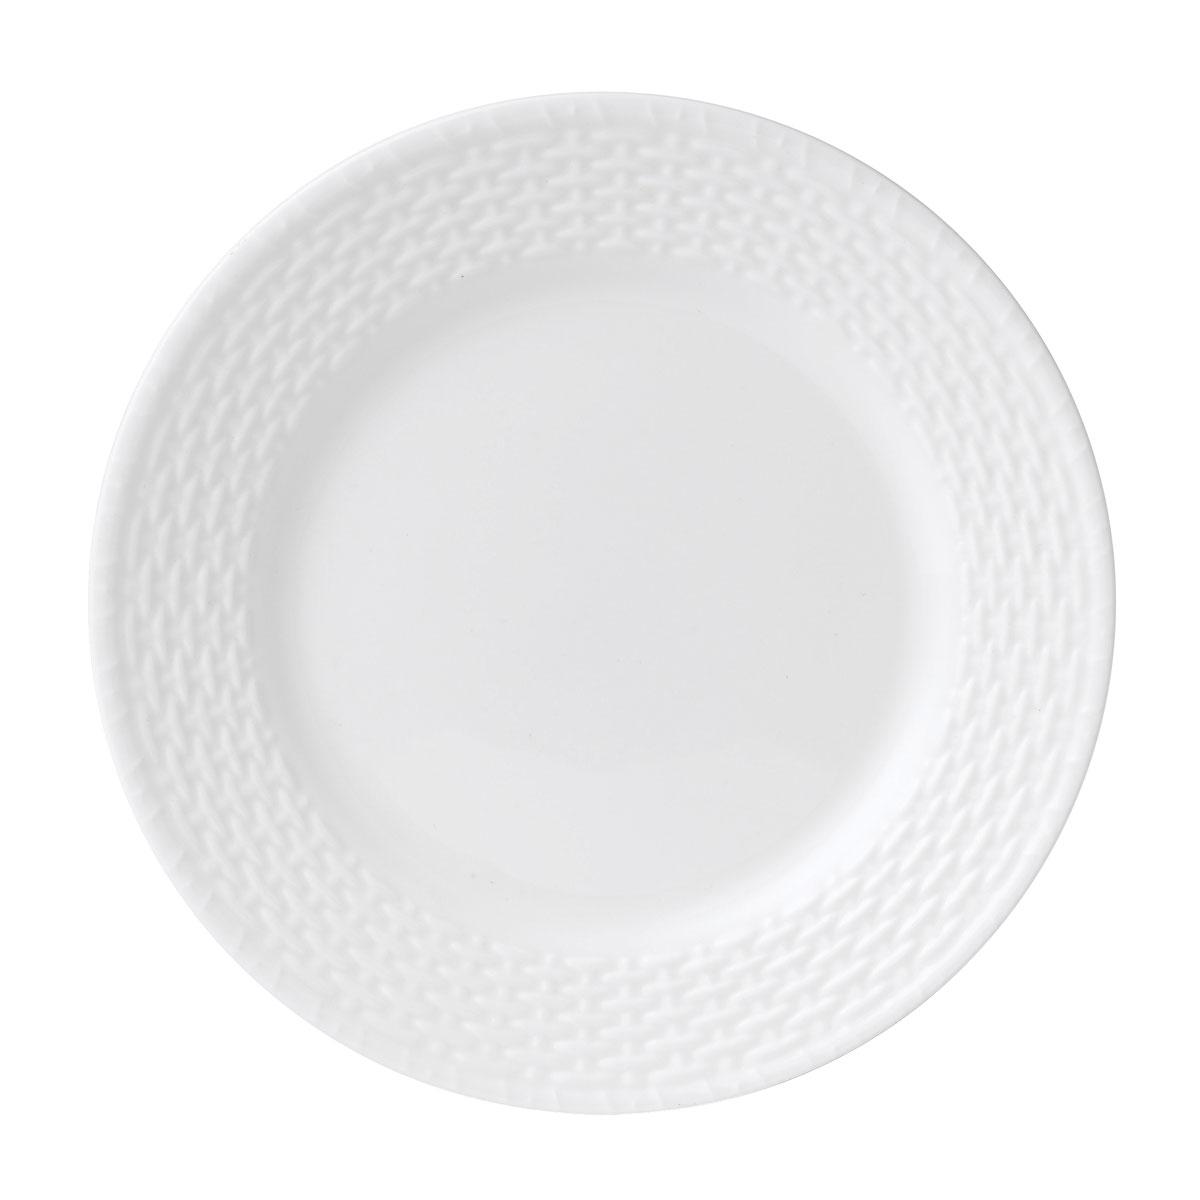 "Wedgwood Nantucket Basket Salad Plate 8.25"""